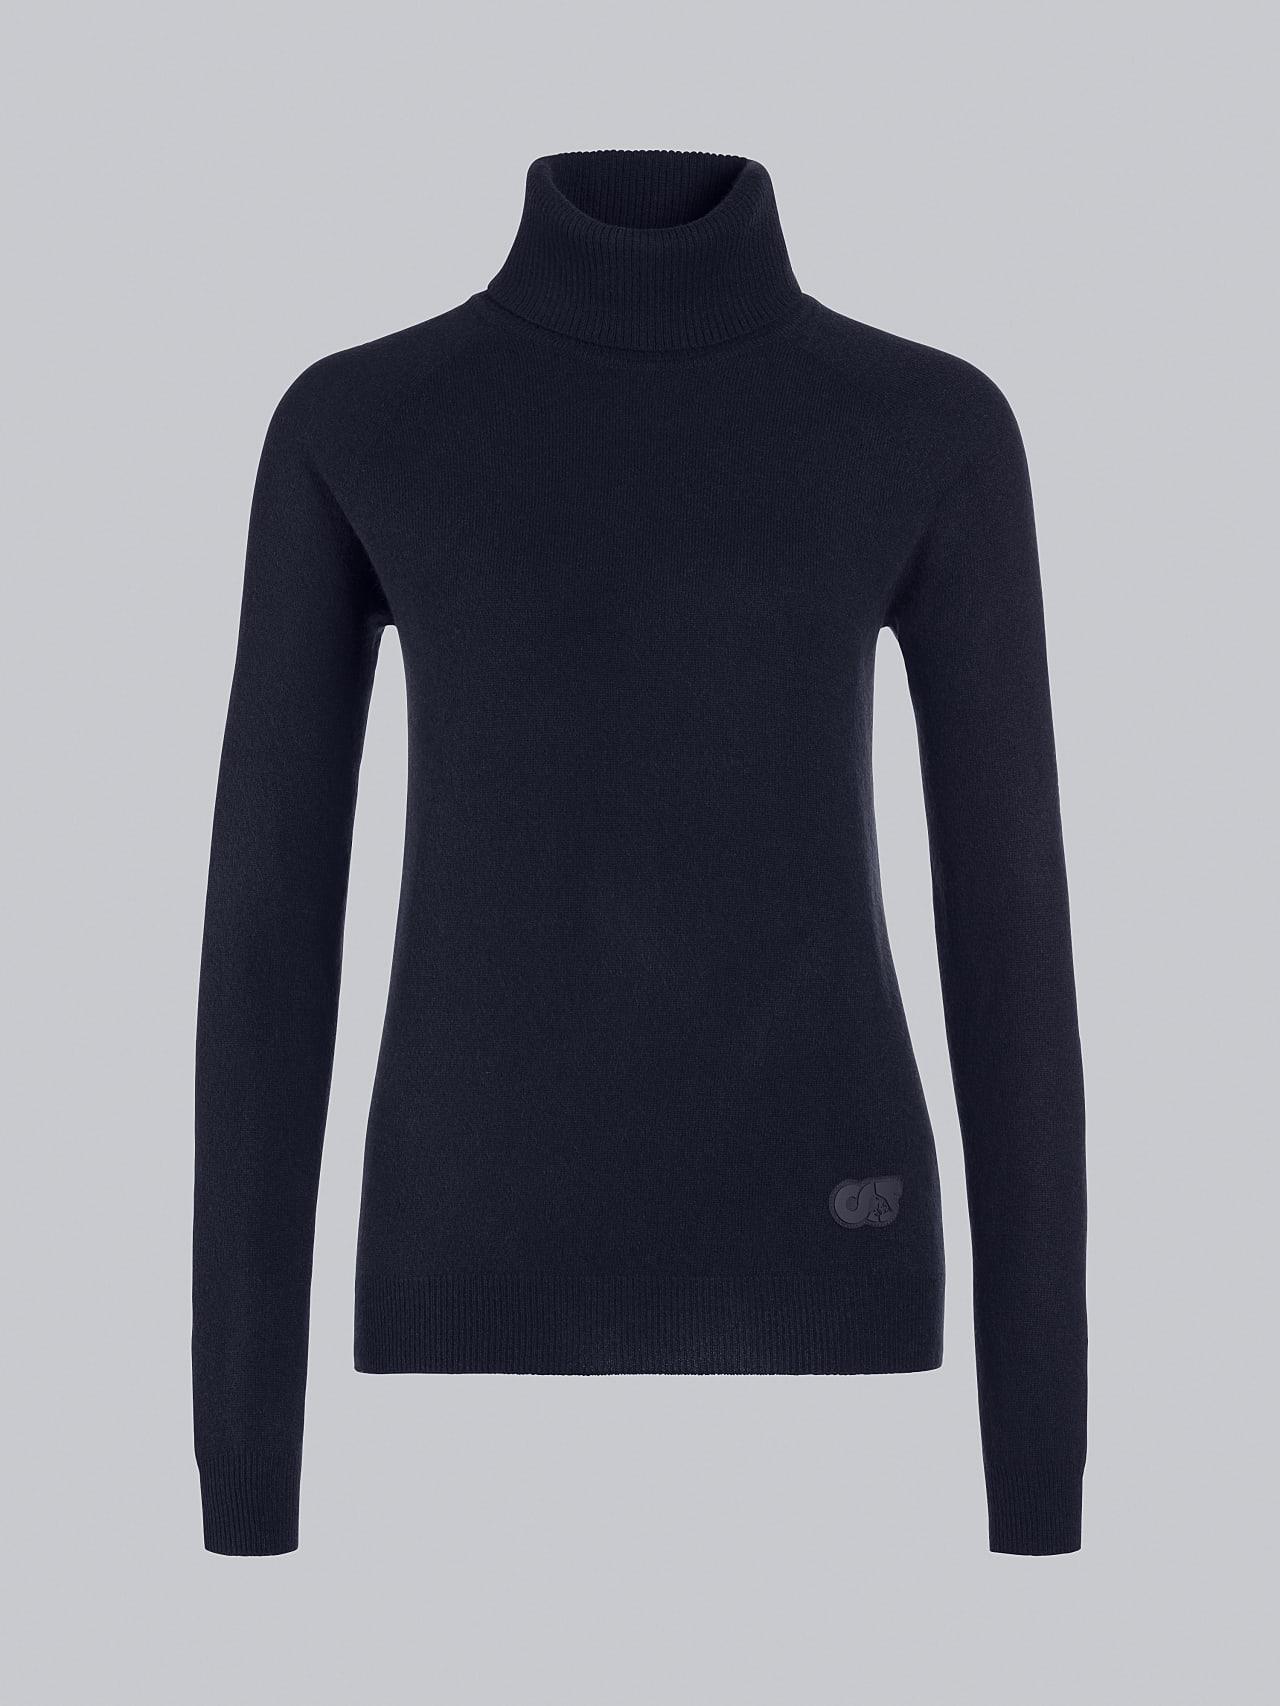 FLAMY V1.Y5.02 Seamless 3D Knit Merino-Cashmere Turtle Neck navy Back Alpha Tauri